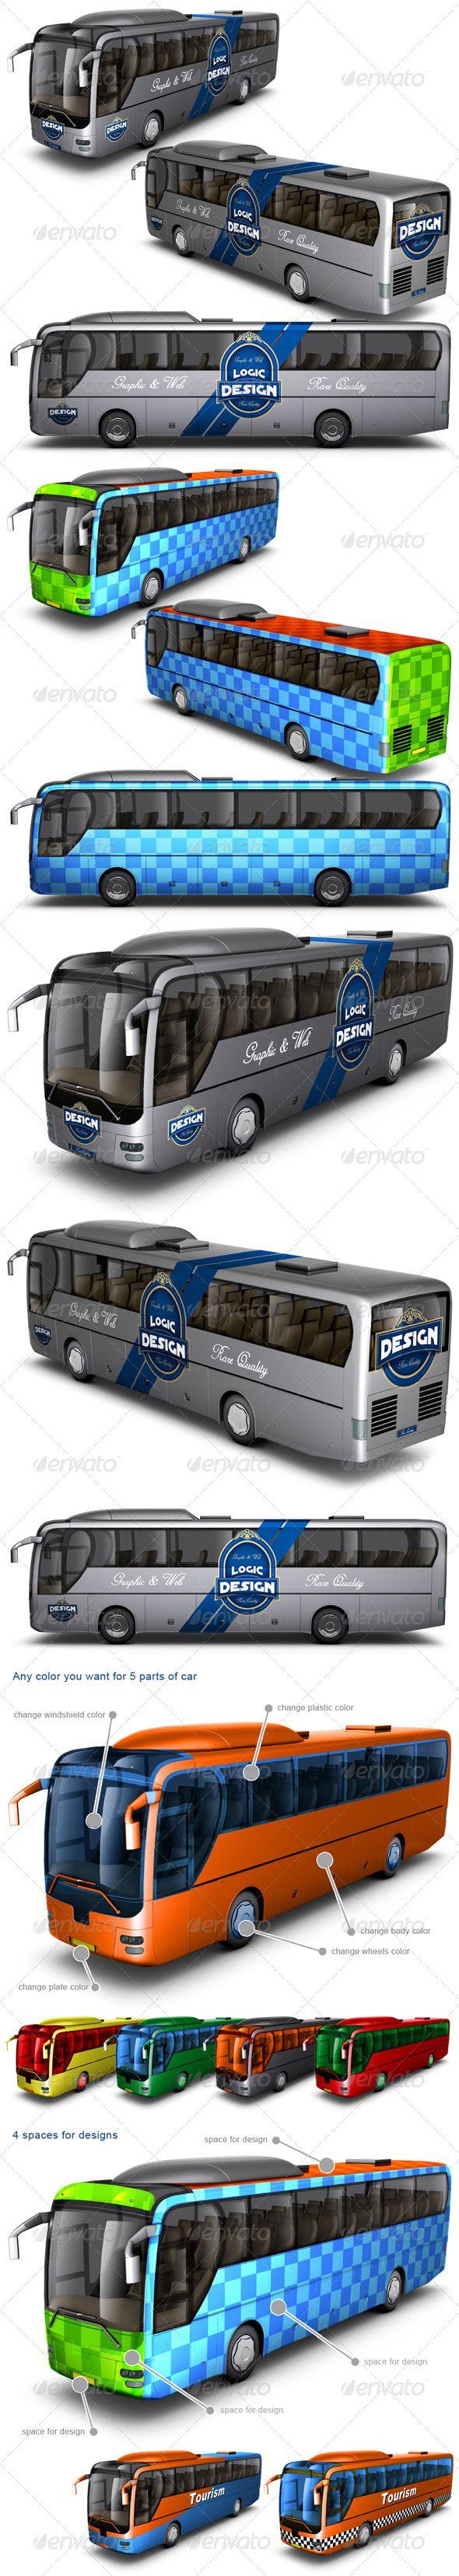 Bus Mock Up Download here: https://graphicriver.net/item/bus-mock-up/2465312?ref=KlitVogli